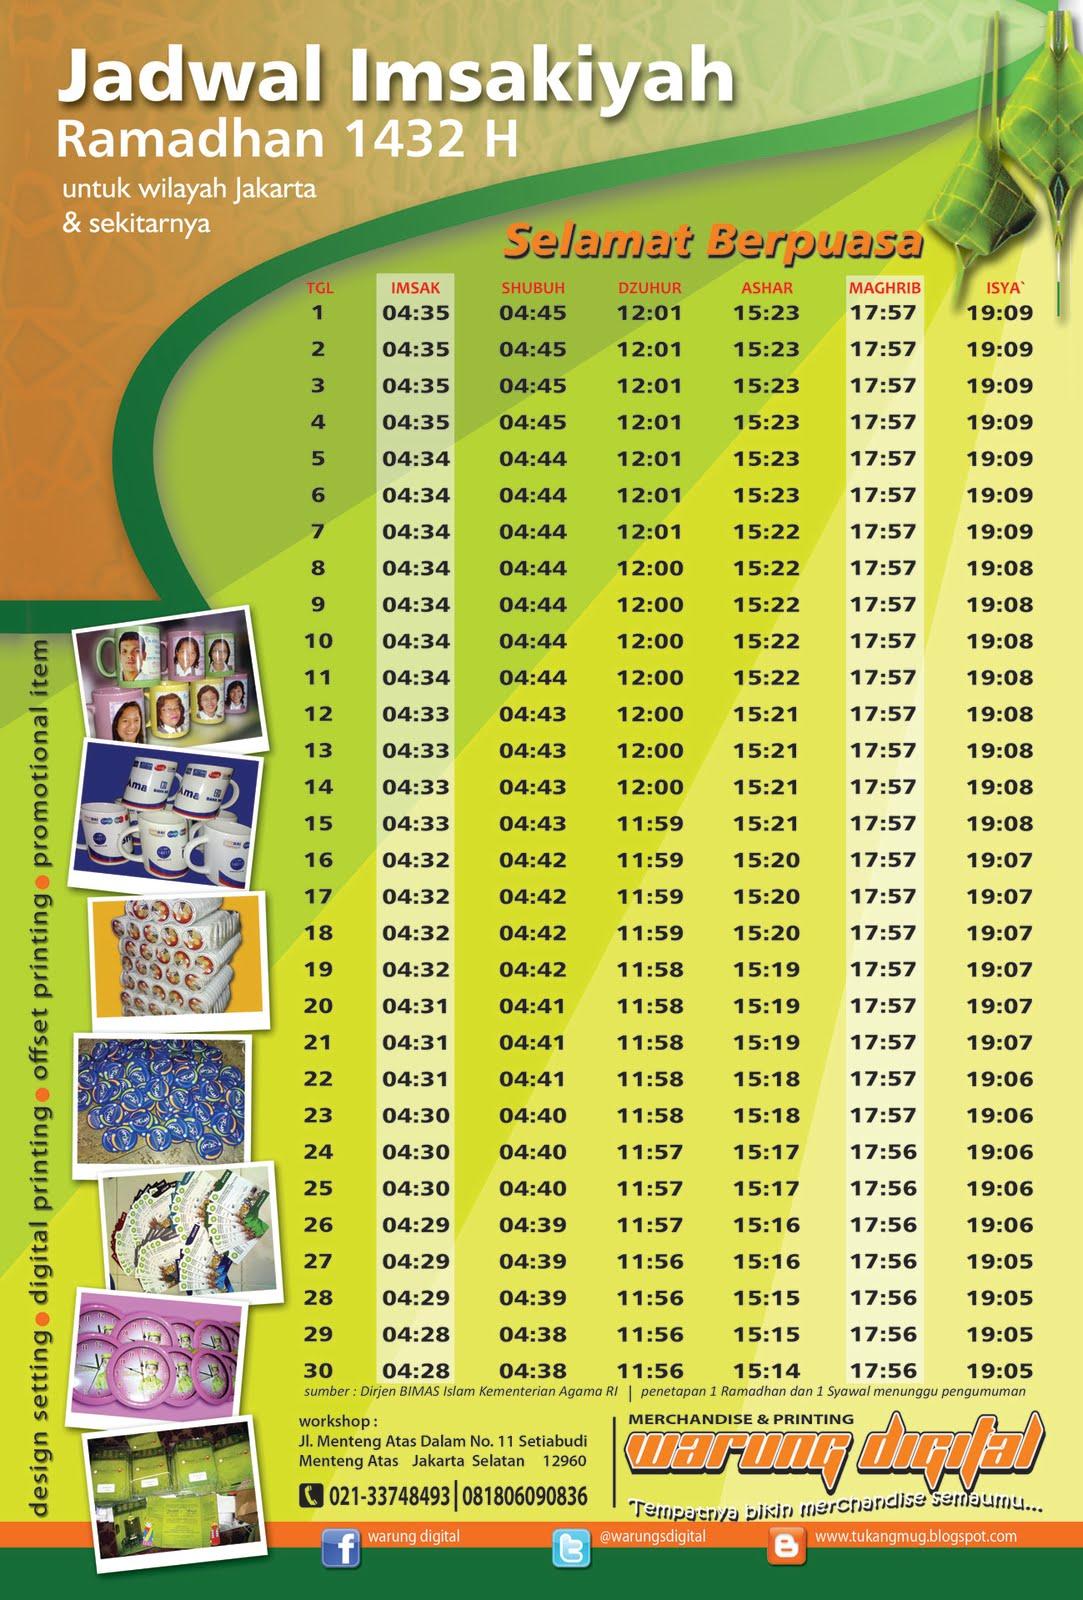 Image Result For Jadwal Imsak Ramadhan